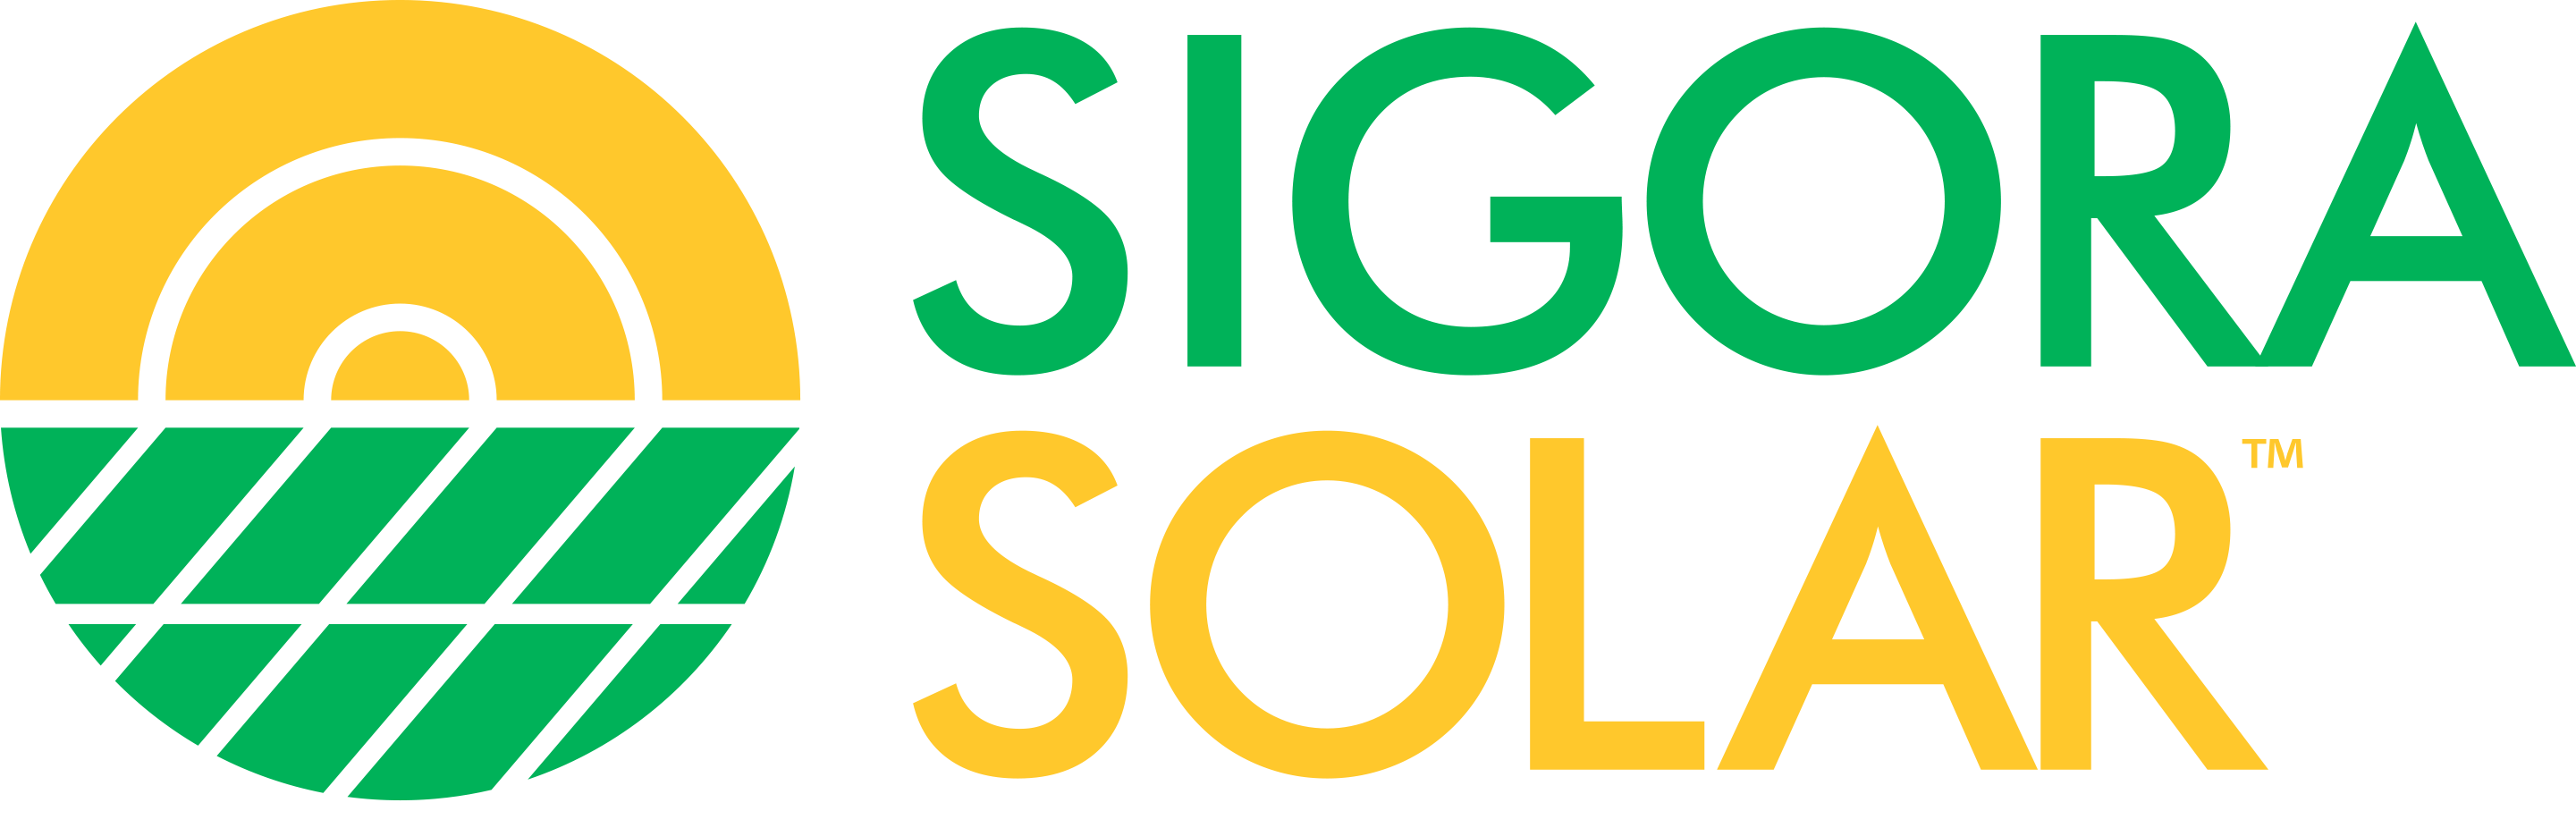 Sigora Logo_TM - Sarah Nerette